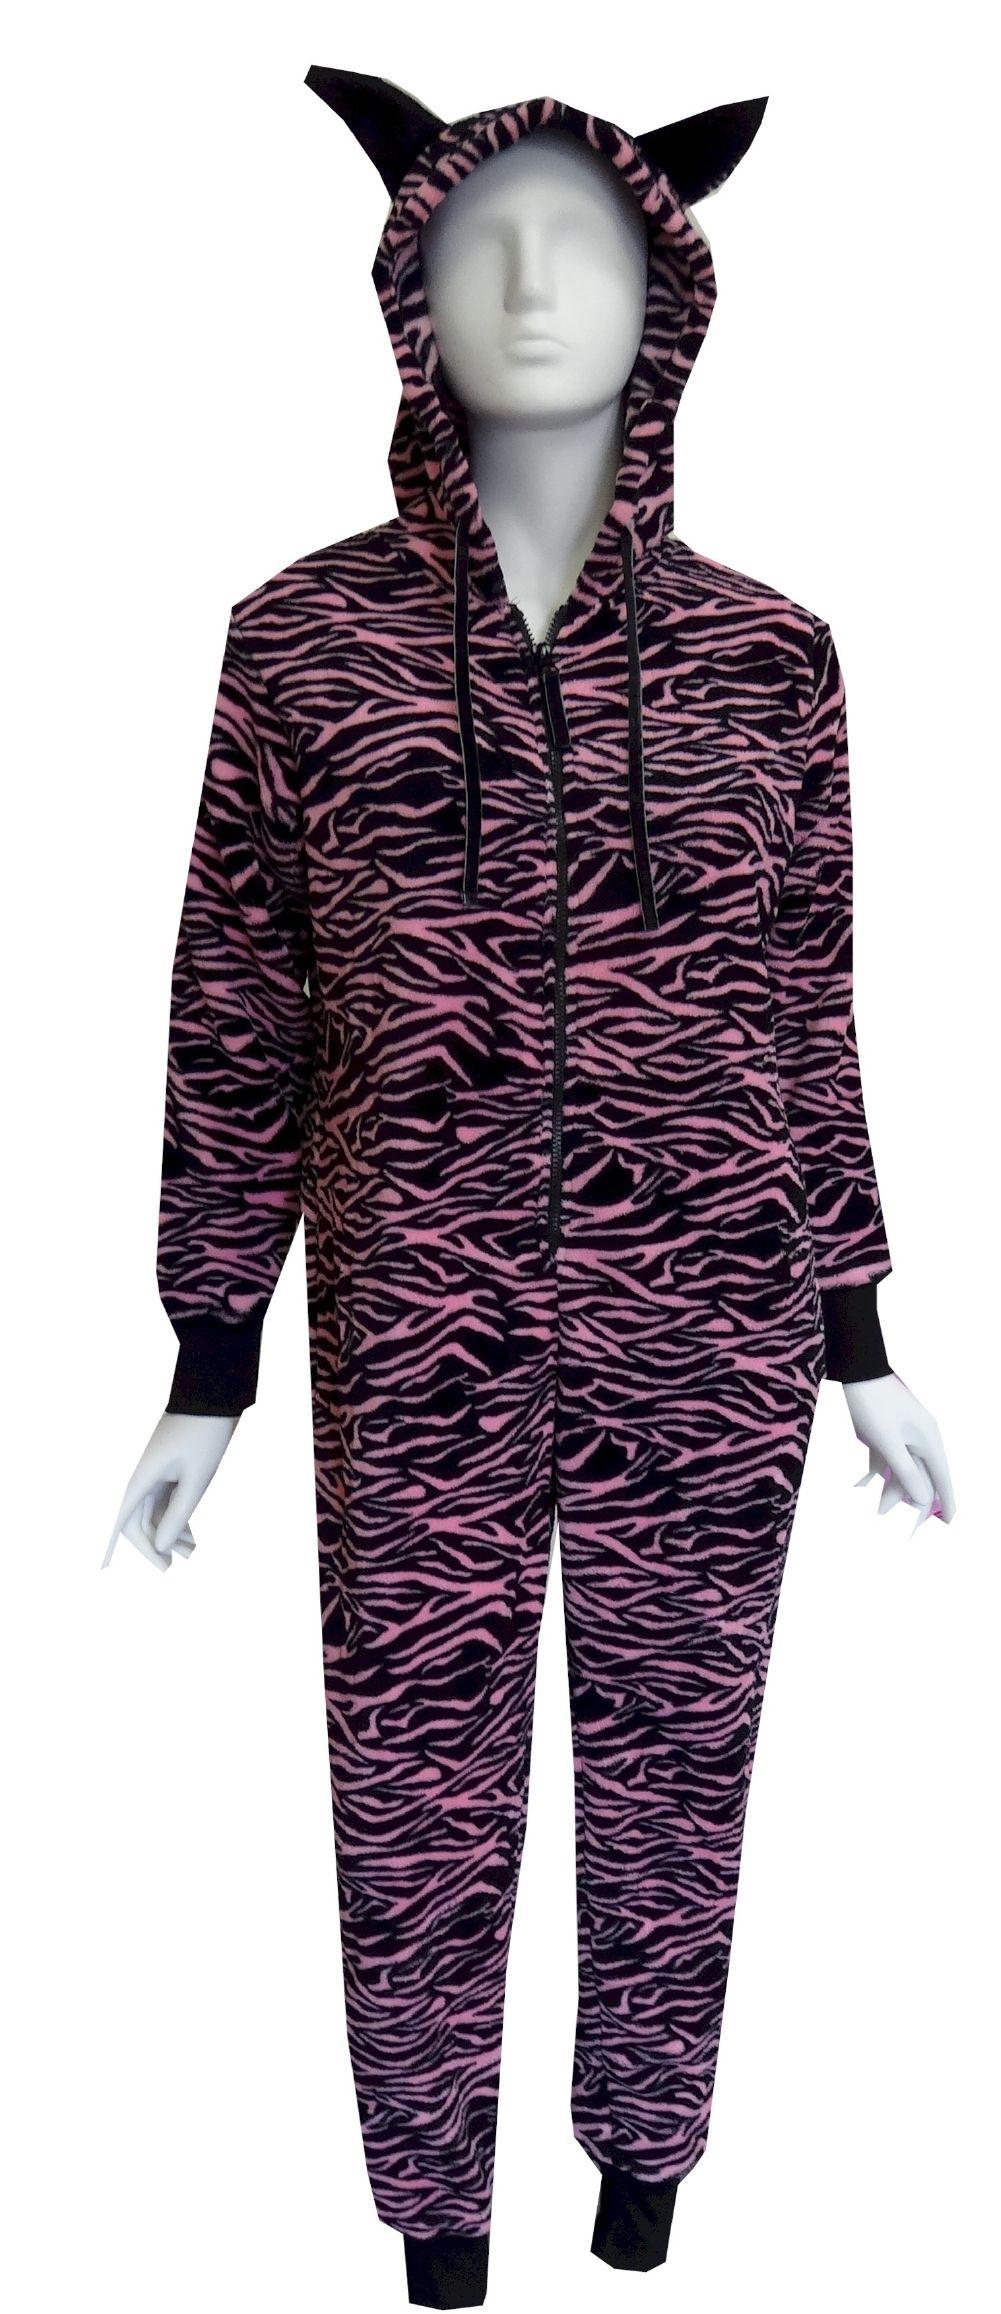 Zebra print plush pink and black one piece hooded pajama one piece